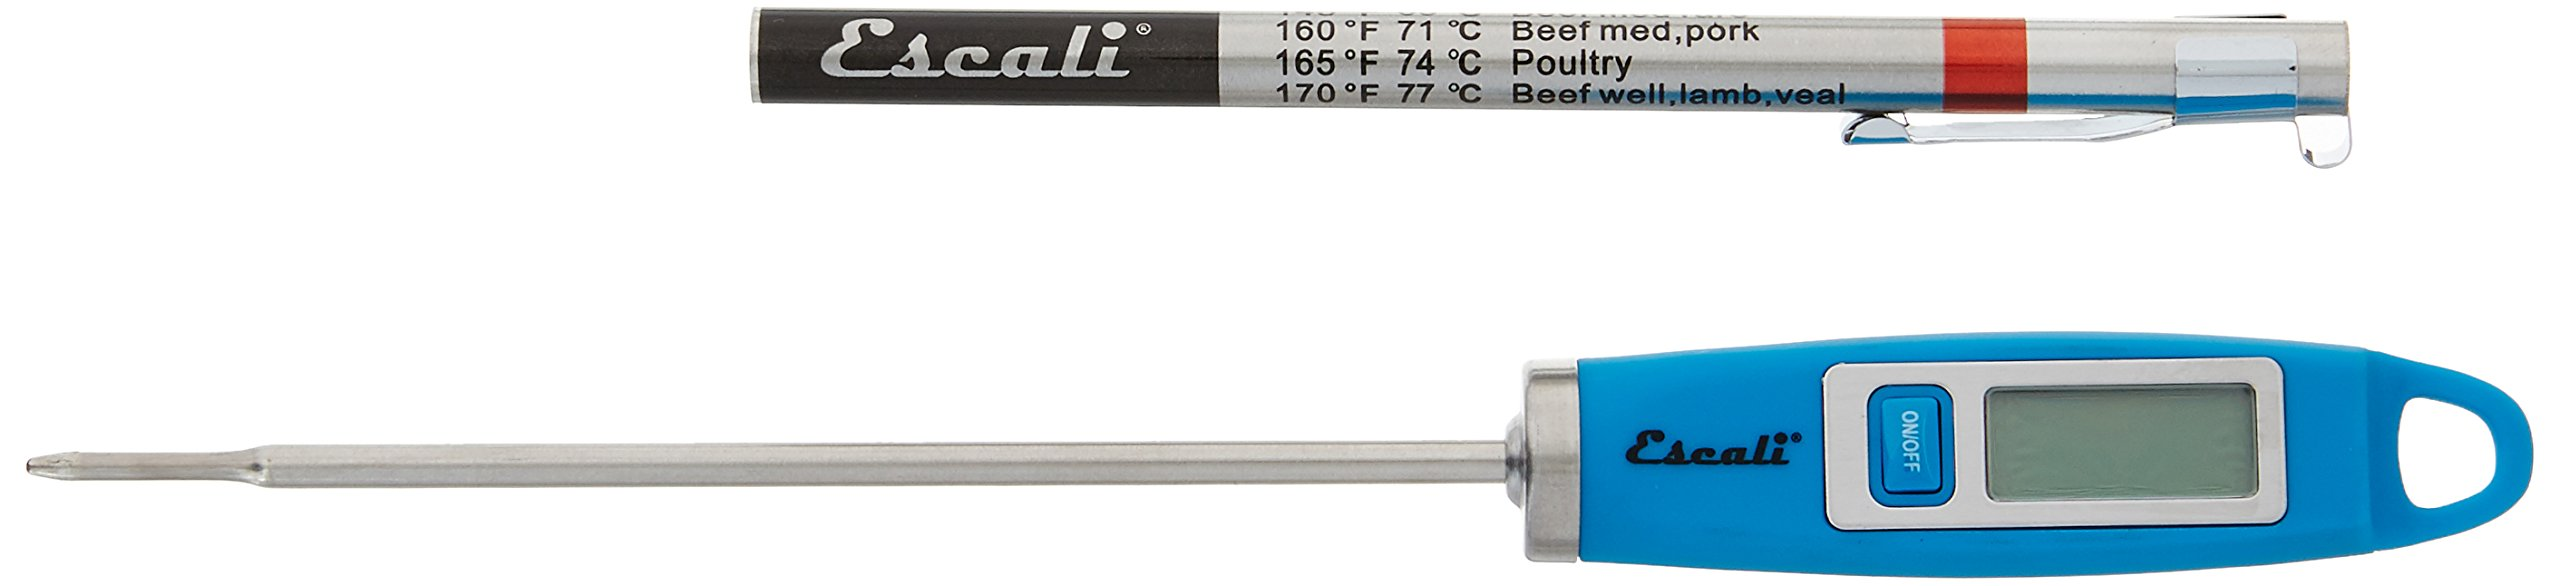 Escali DH1-U NSF Listed Gourmet Digital Thermometer, Blue